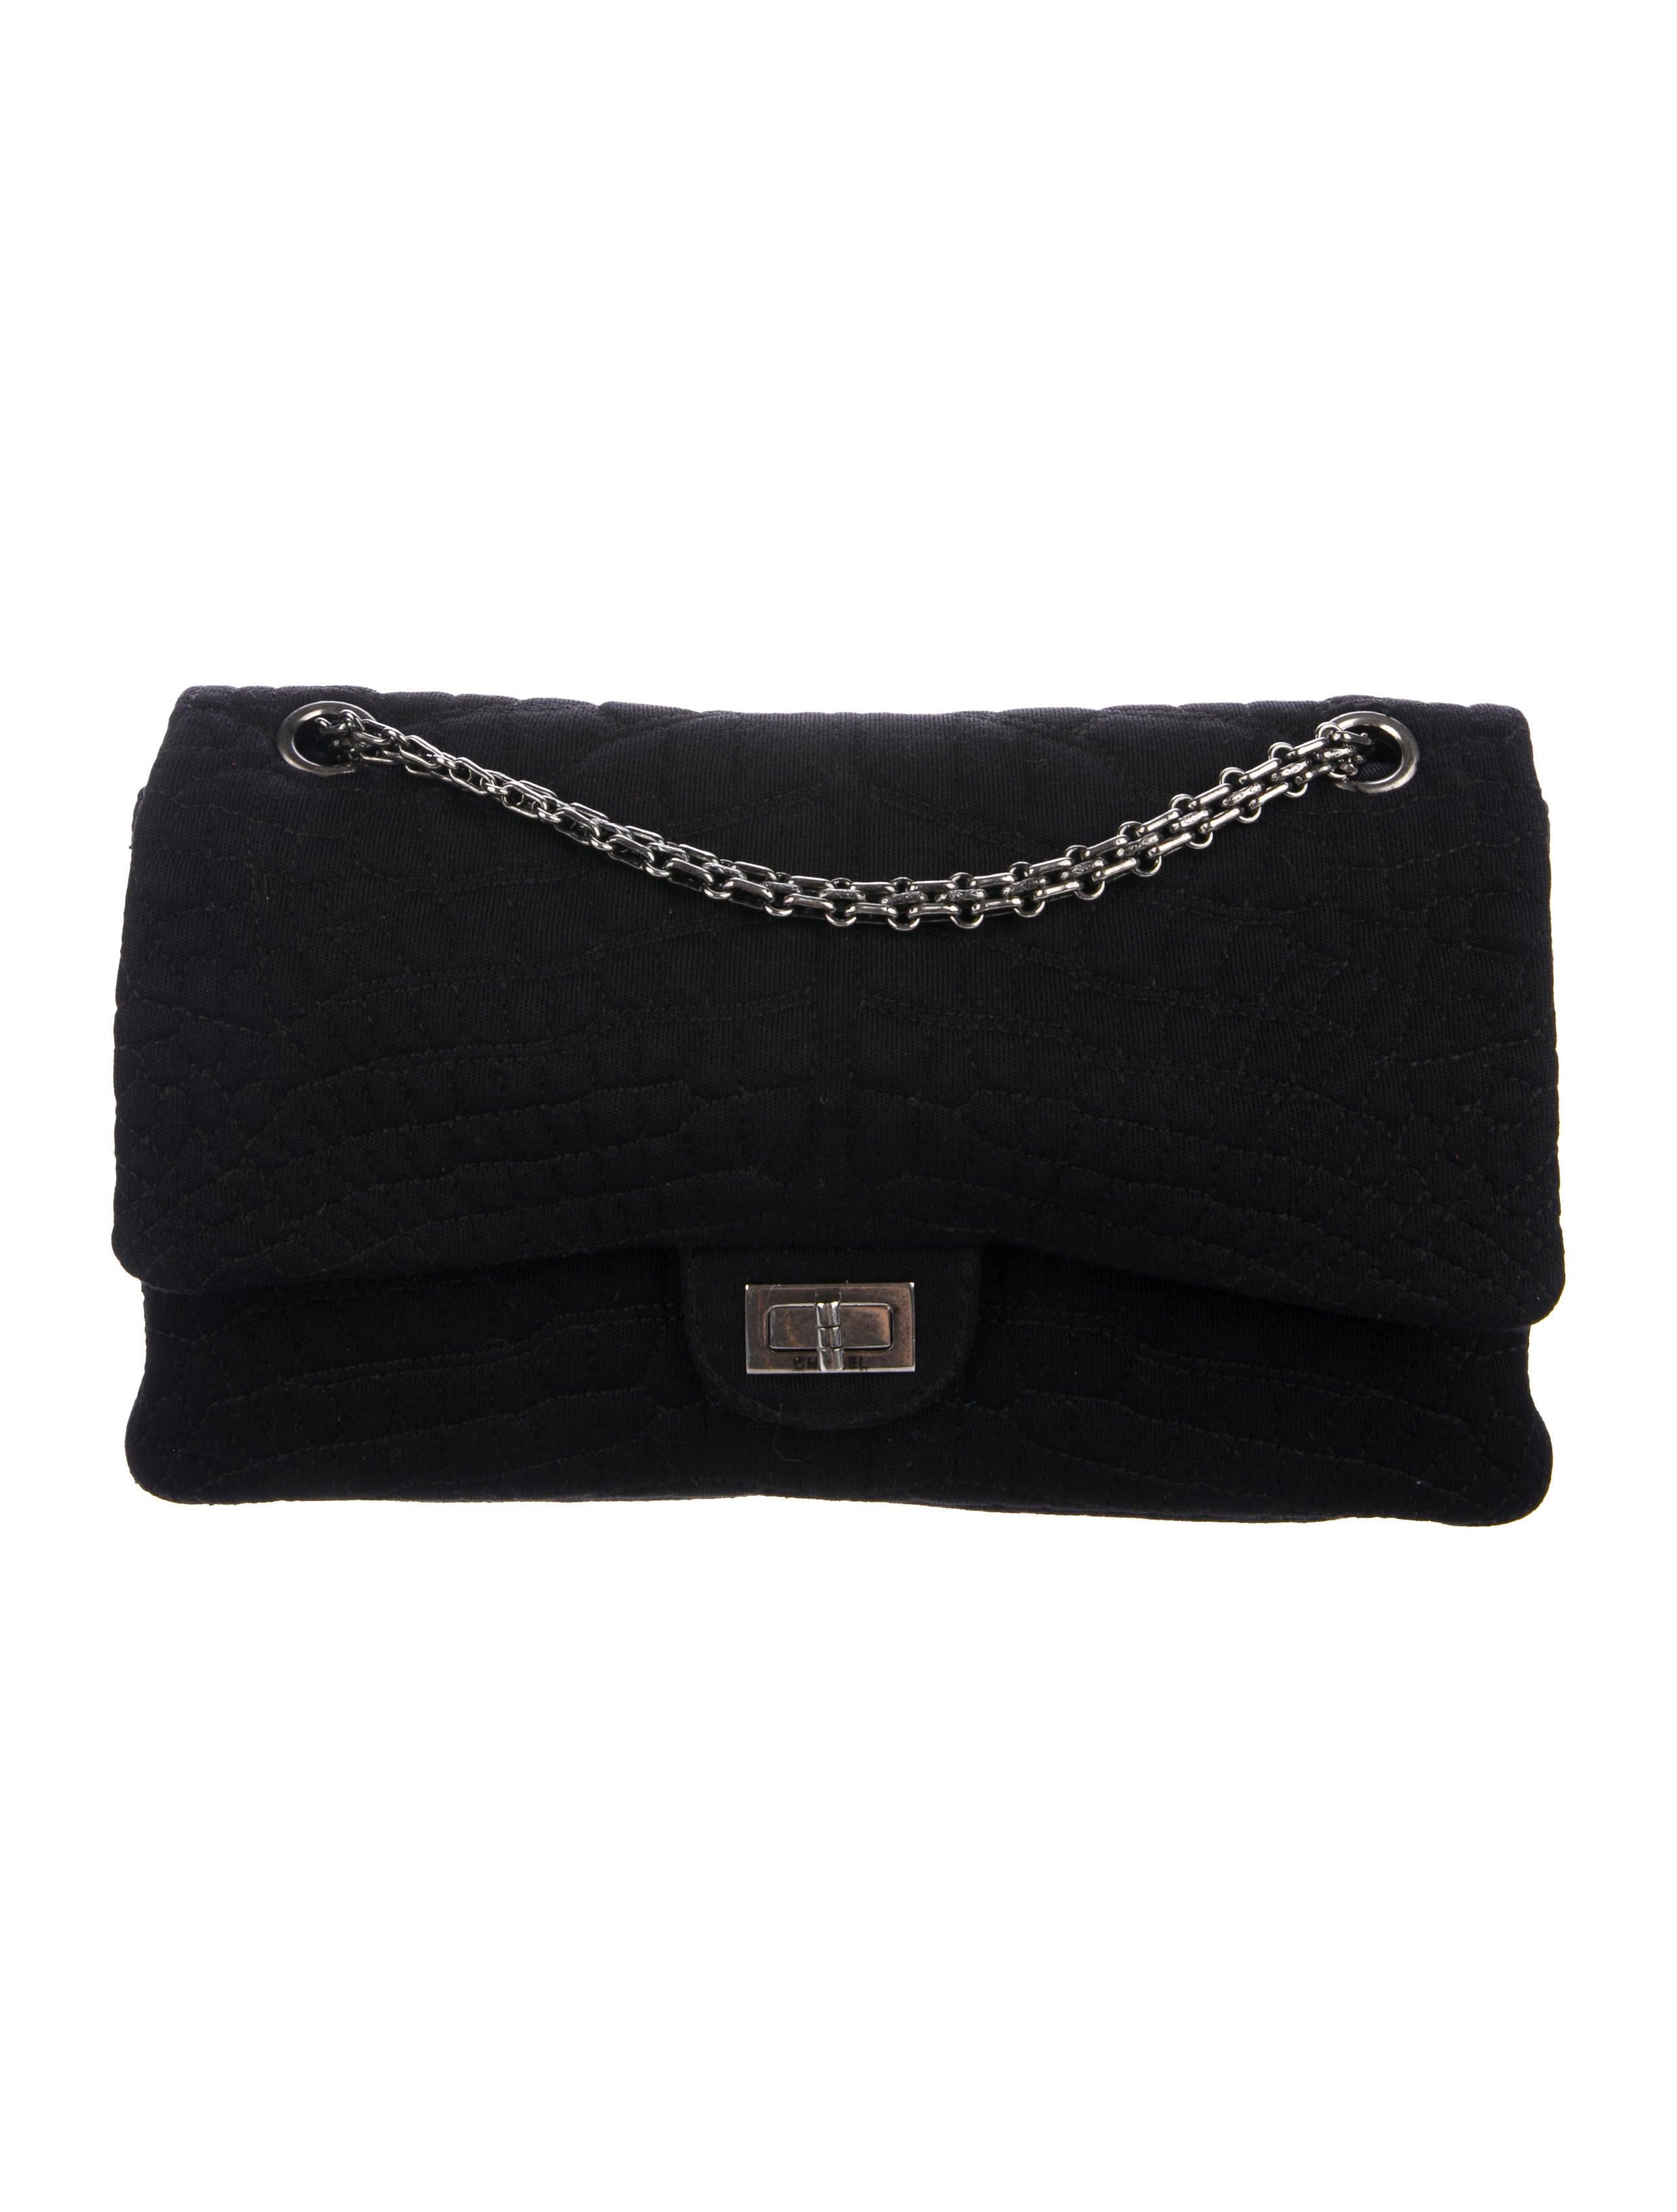 33e5e6f8db0c9a Chanel VIP Crossbody Bag - Handbags - CHA179257 | The RealReal